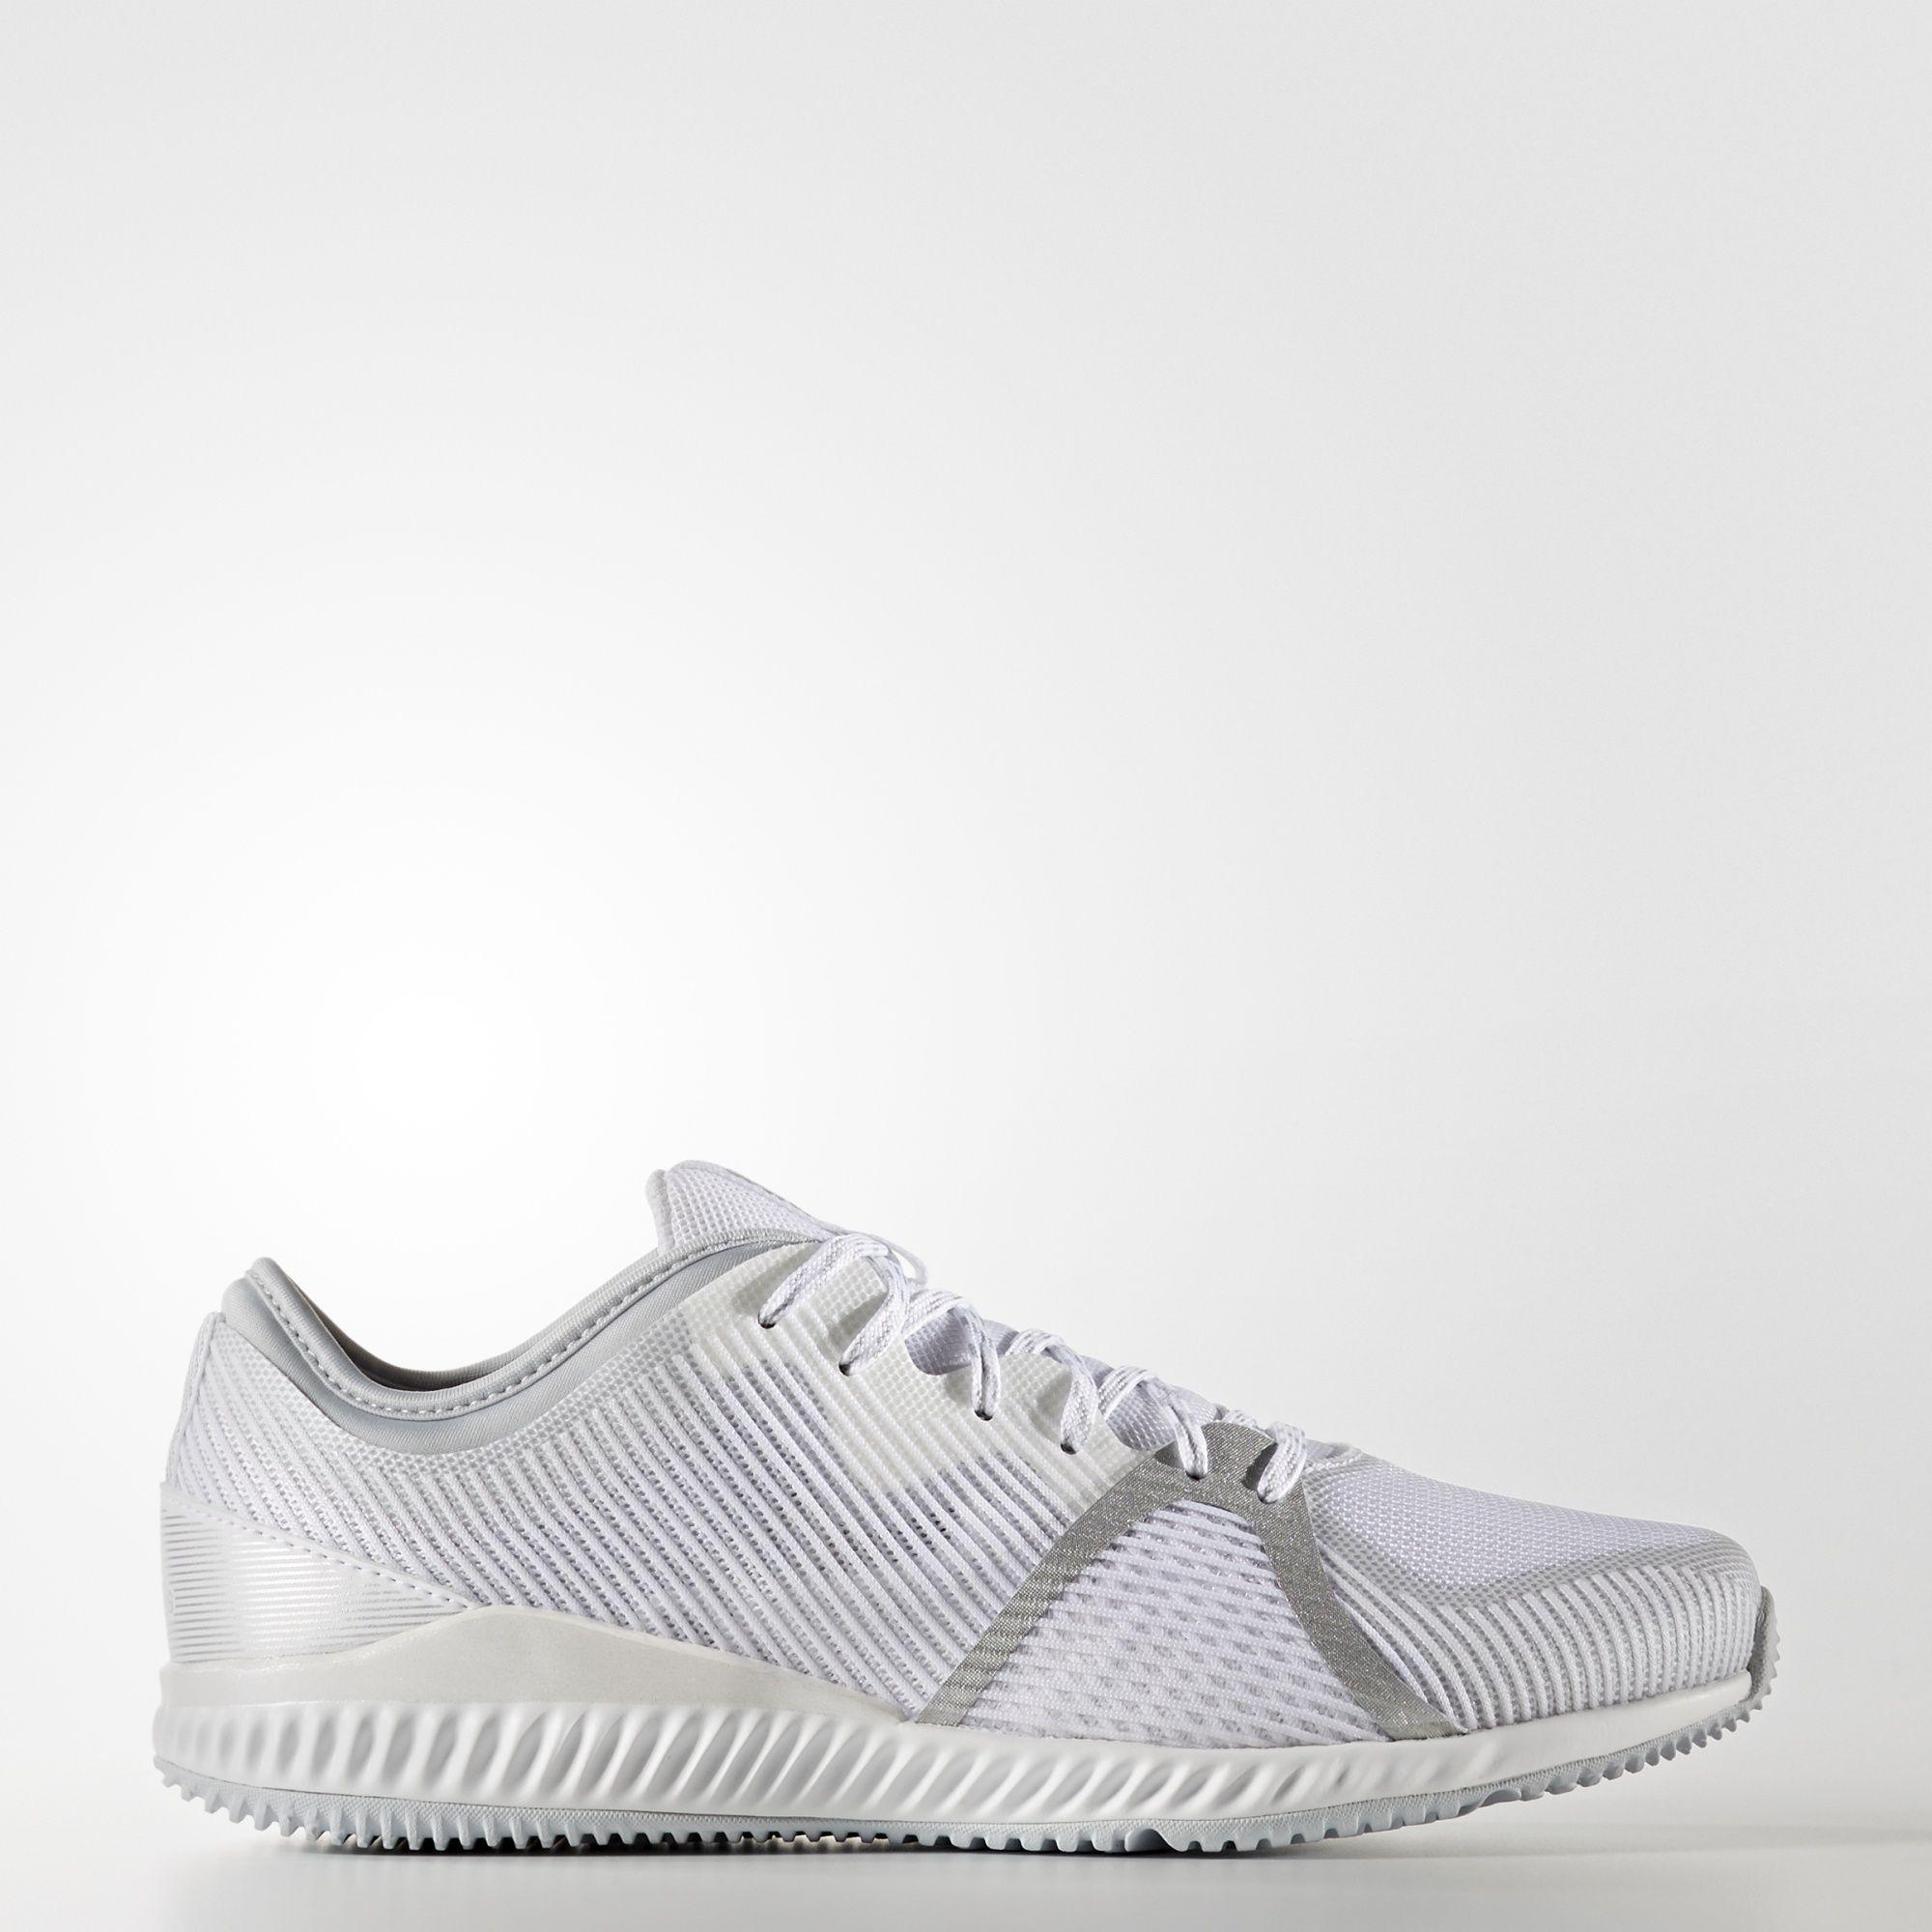 adidas CrazyTrain Pro Shoes - Womens Shoes